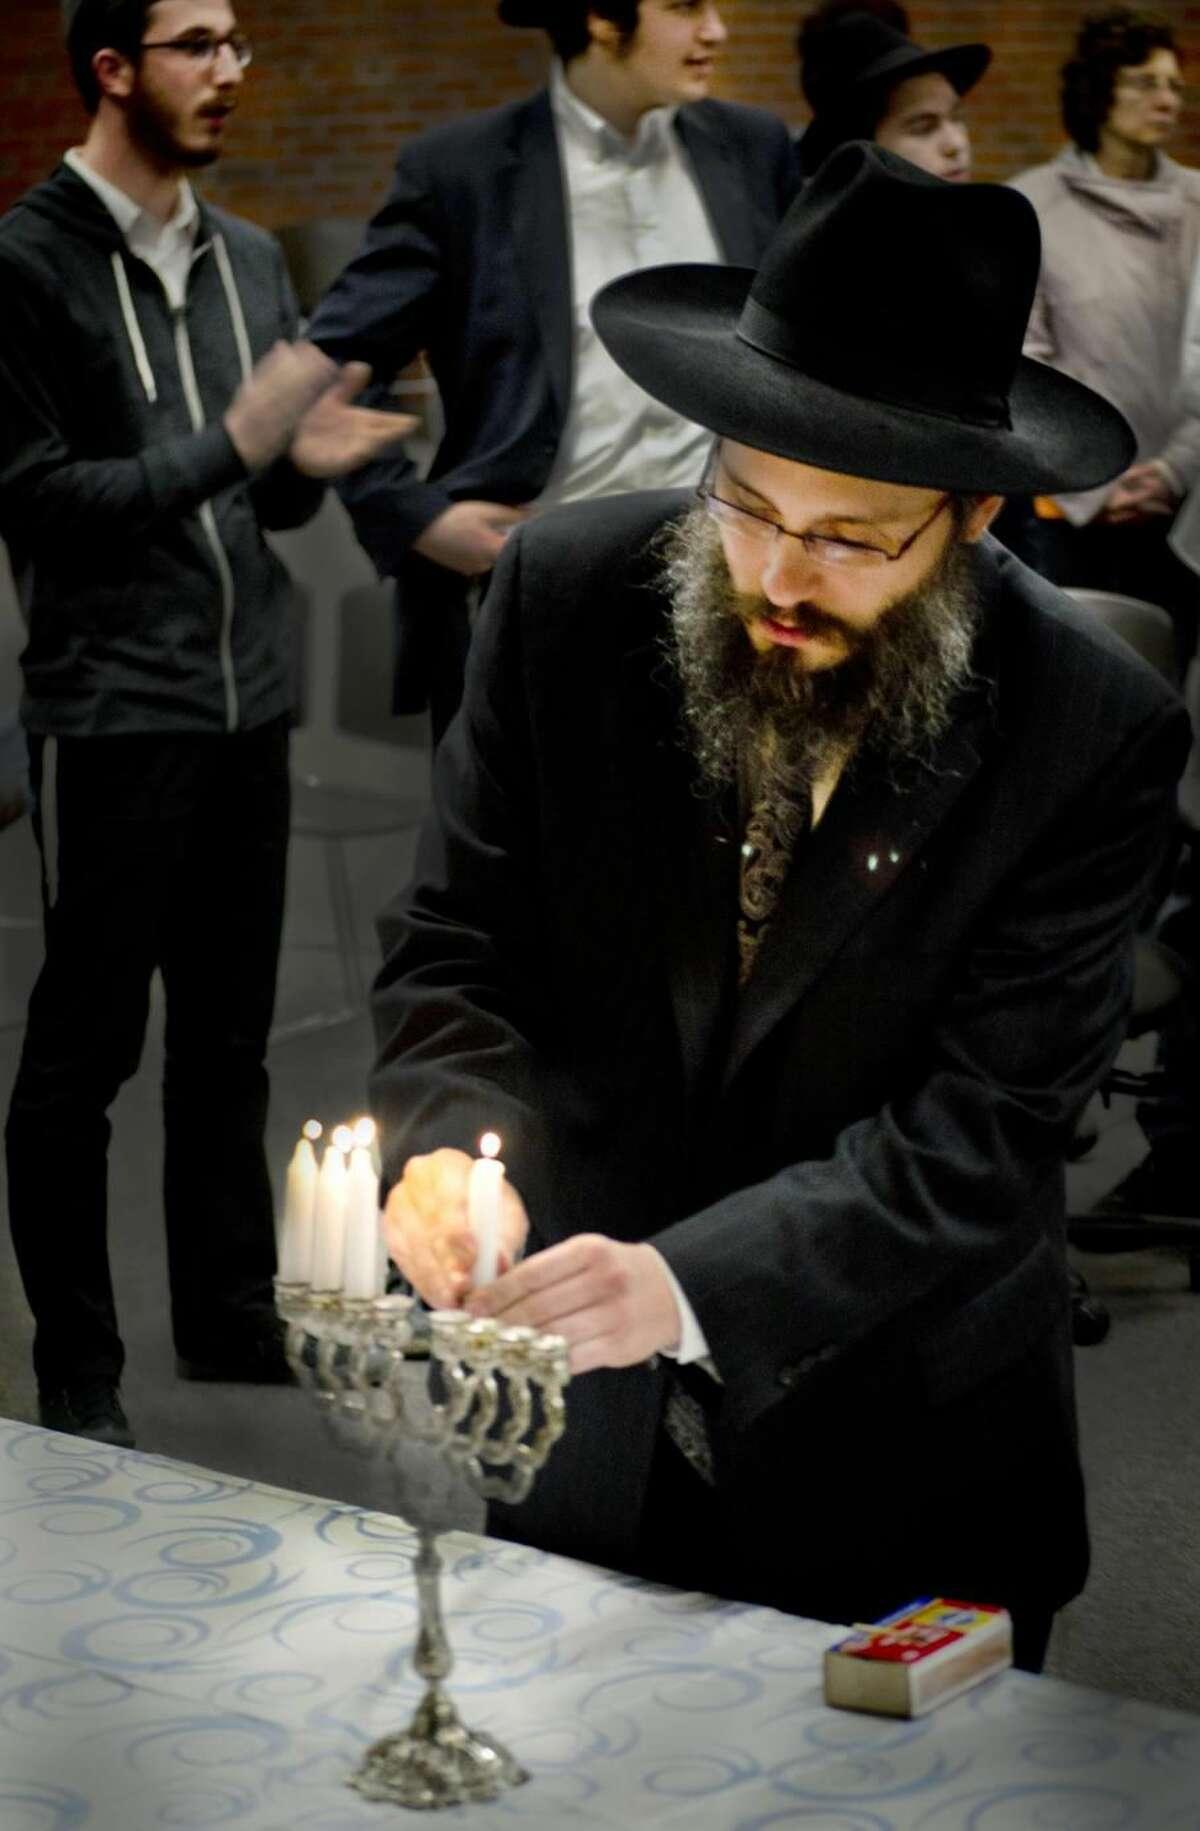 Hamden- Rabbi Menachem Pierkarski, of Chabad Hamden, places the Shamash into the Menorah after a Chanukah Menorah lighting ceremony at Thorton Wilder Hall. Melanie Stengel/Register